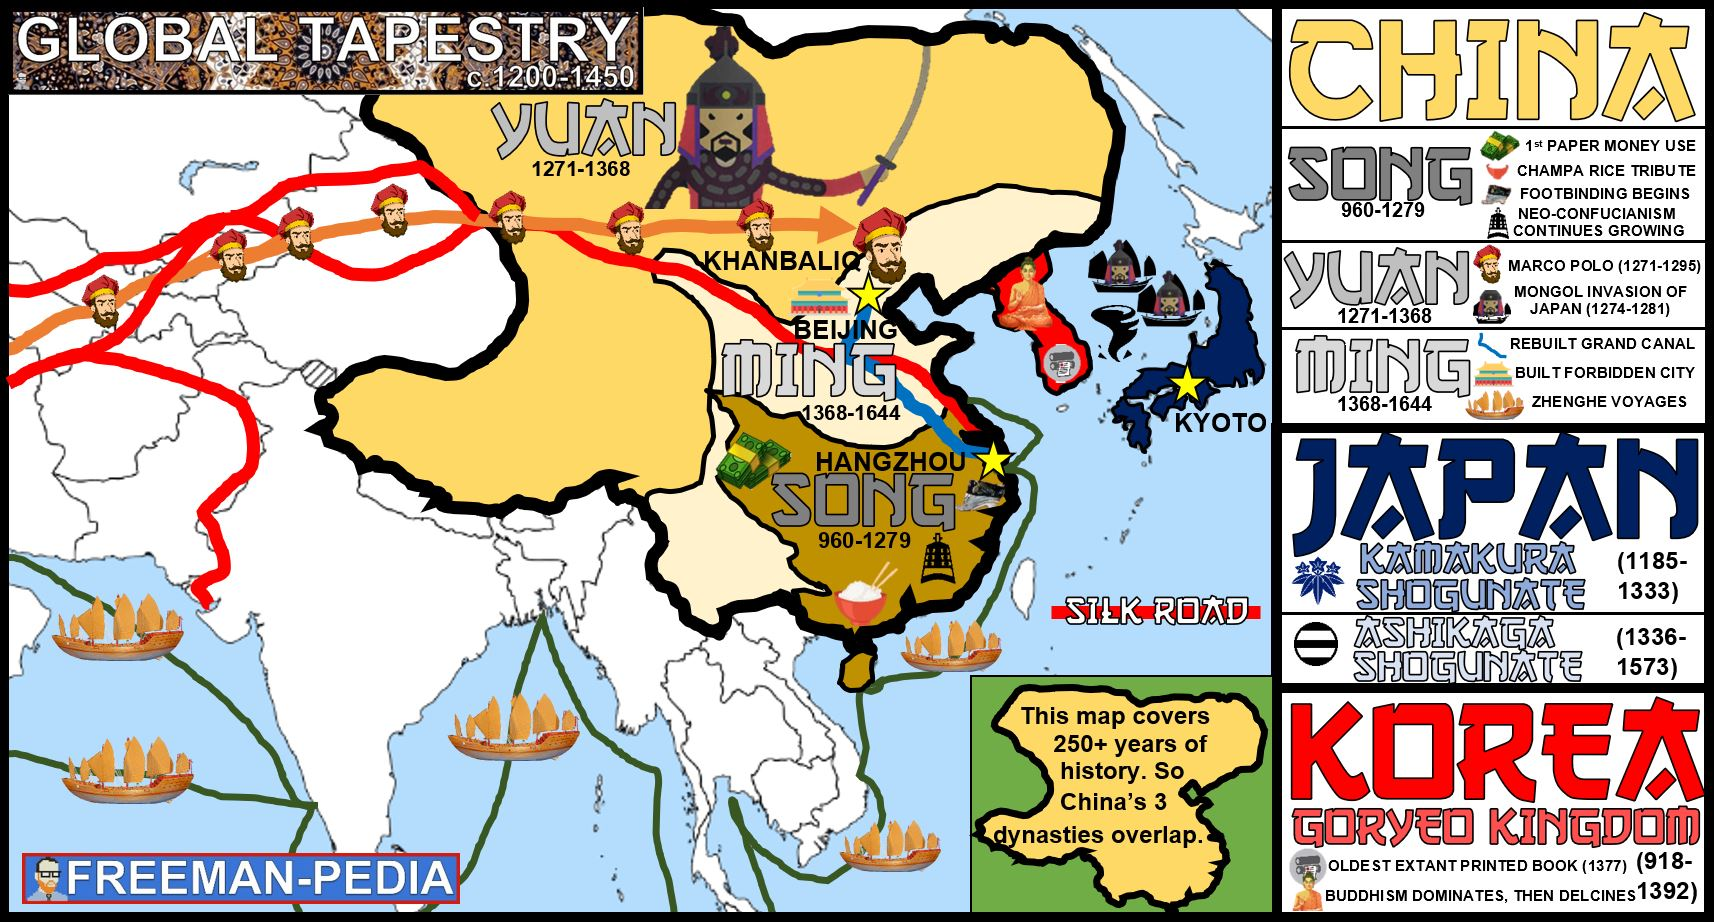 GLOBAL TAPESTRY EAST ASIA MAP FREEMANPEDIA.JPG